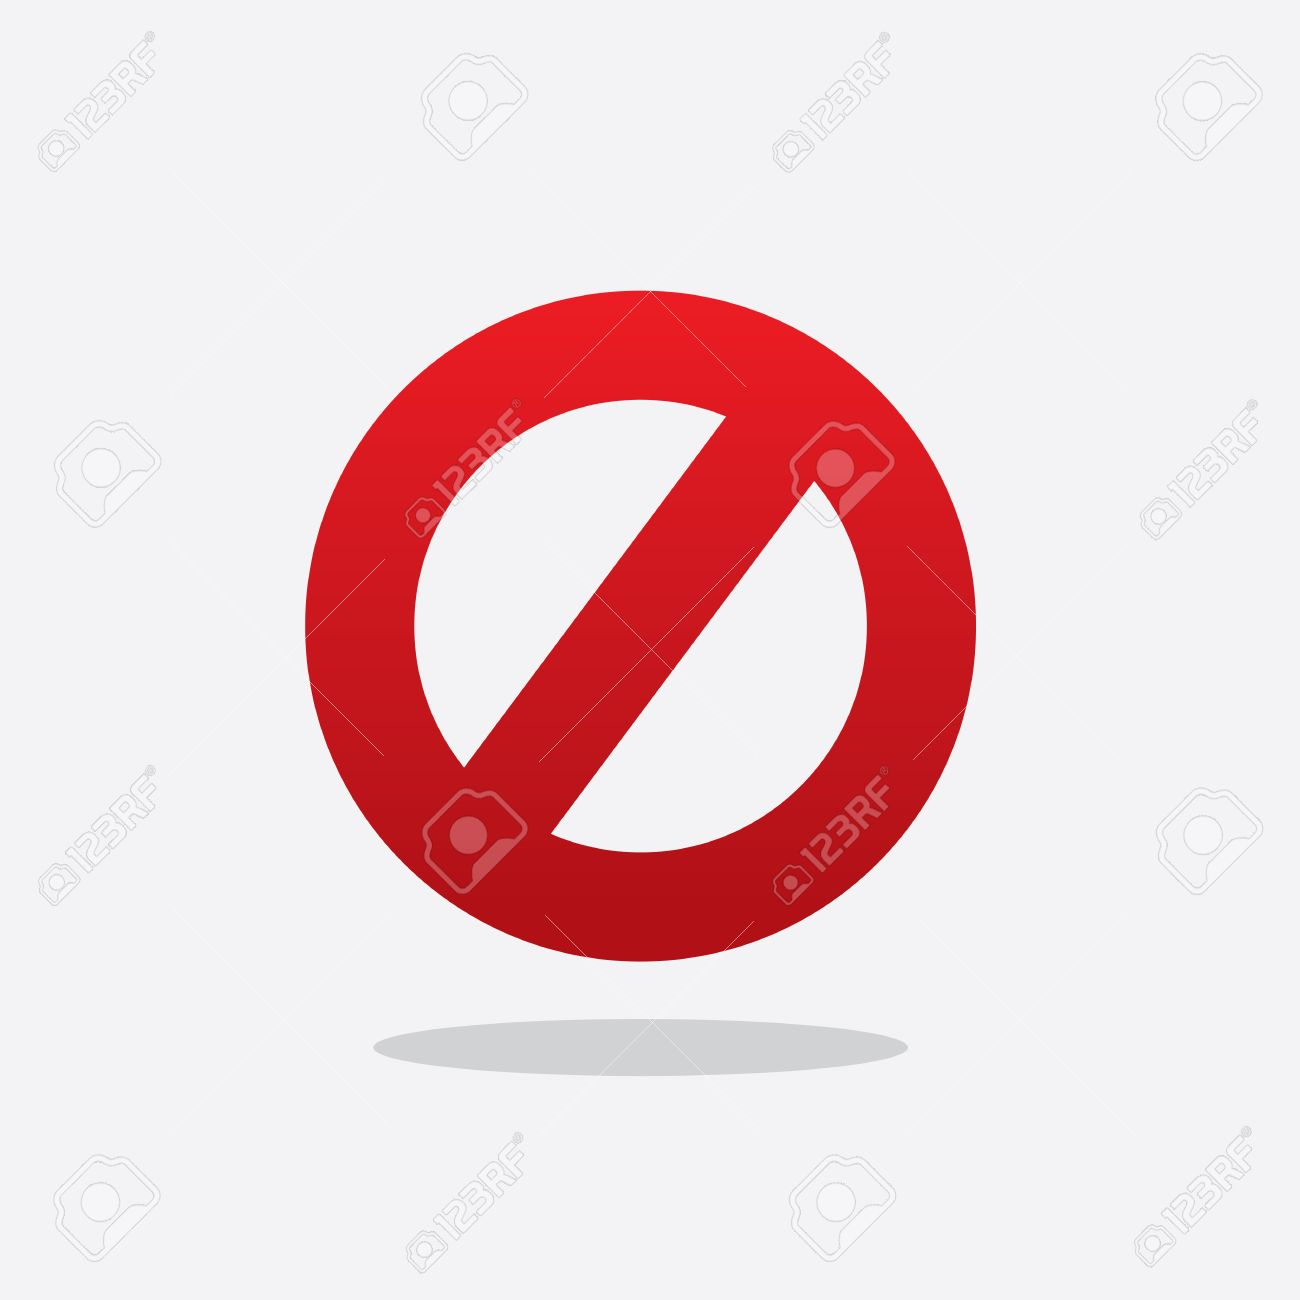 Floating Red Cross Out Do Not Sign Royalty Fri Clipart Vektorer Och